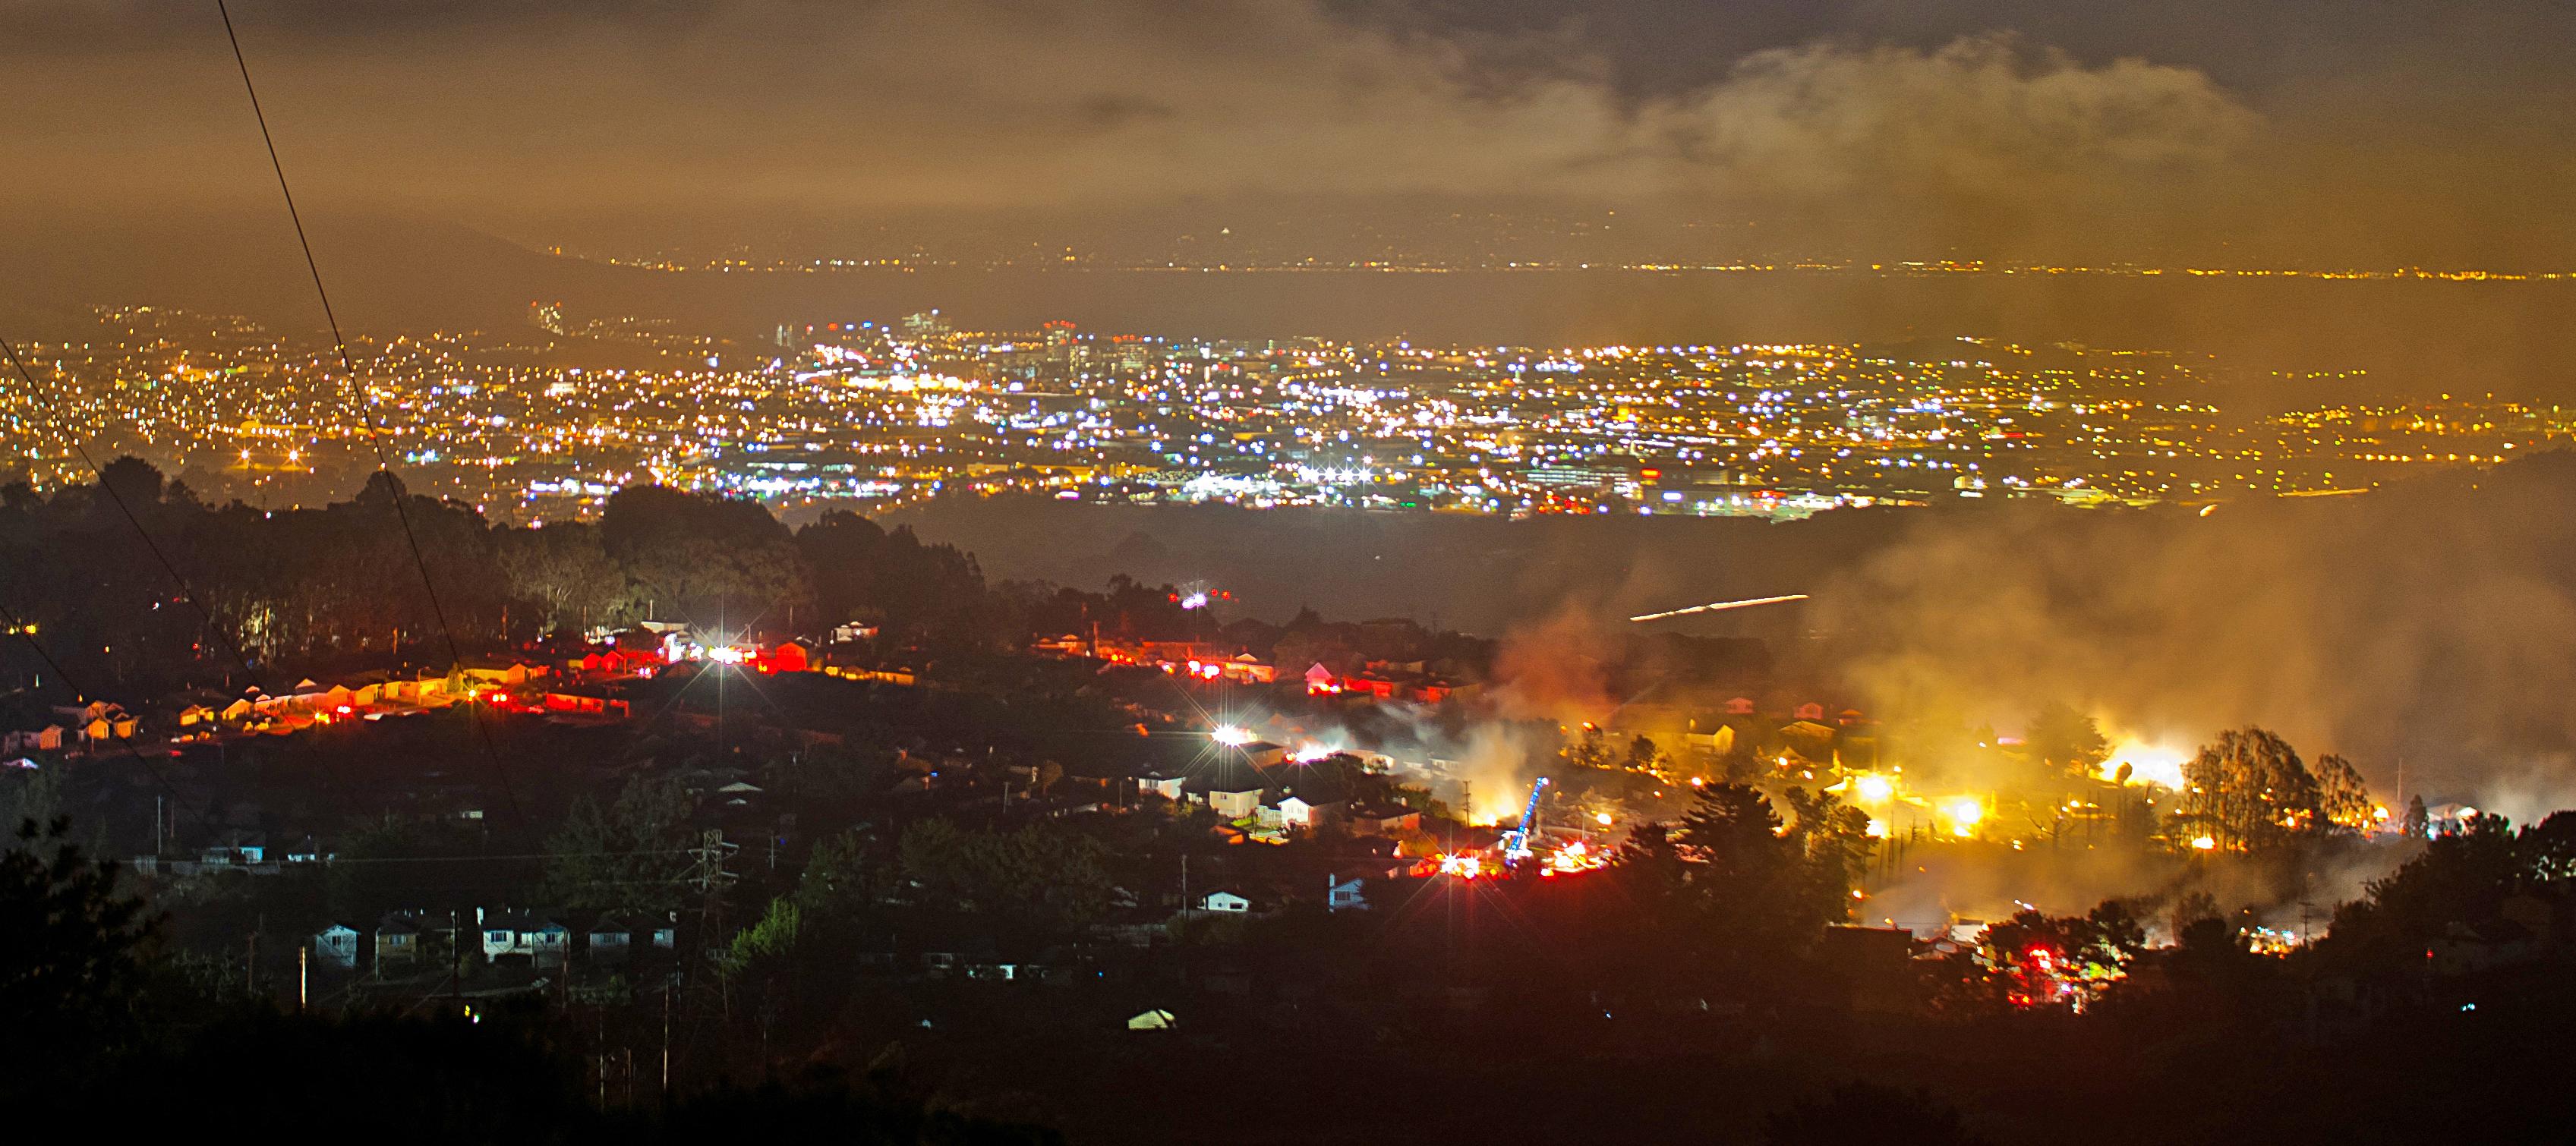 2010 San Bruno fire